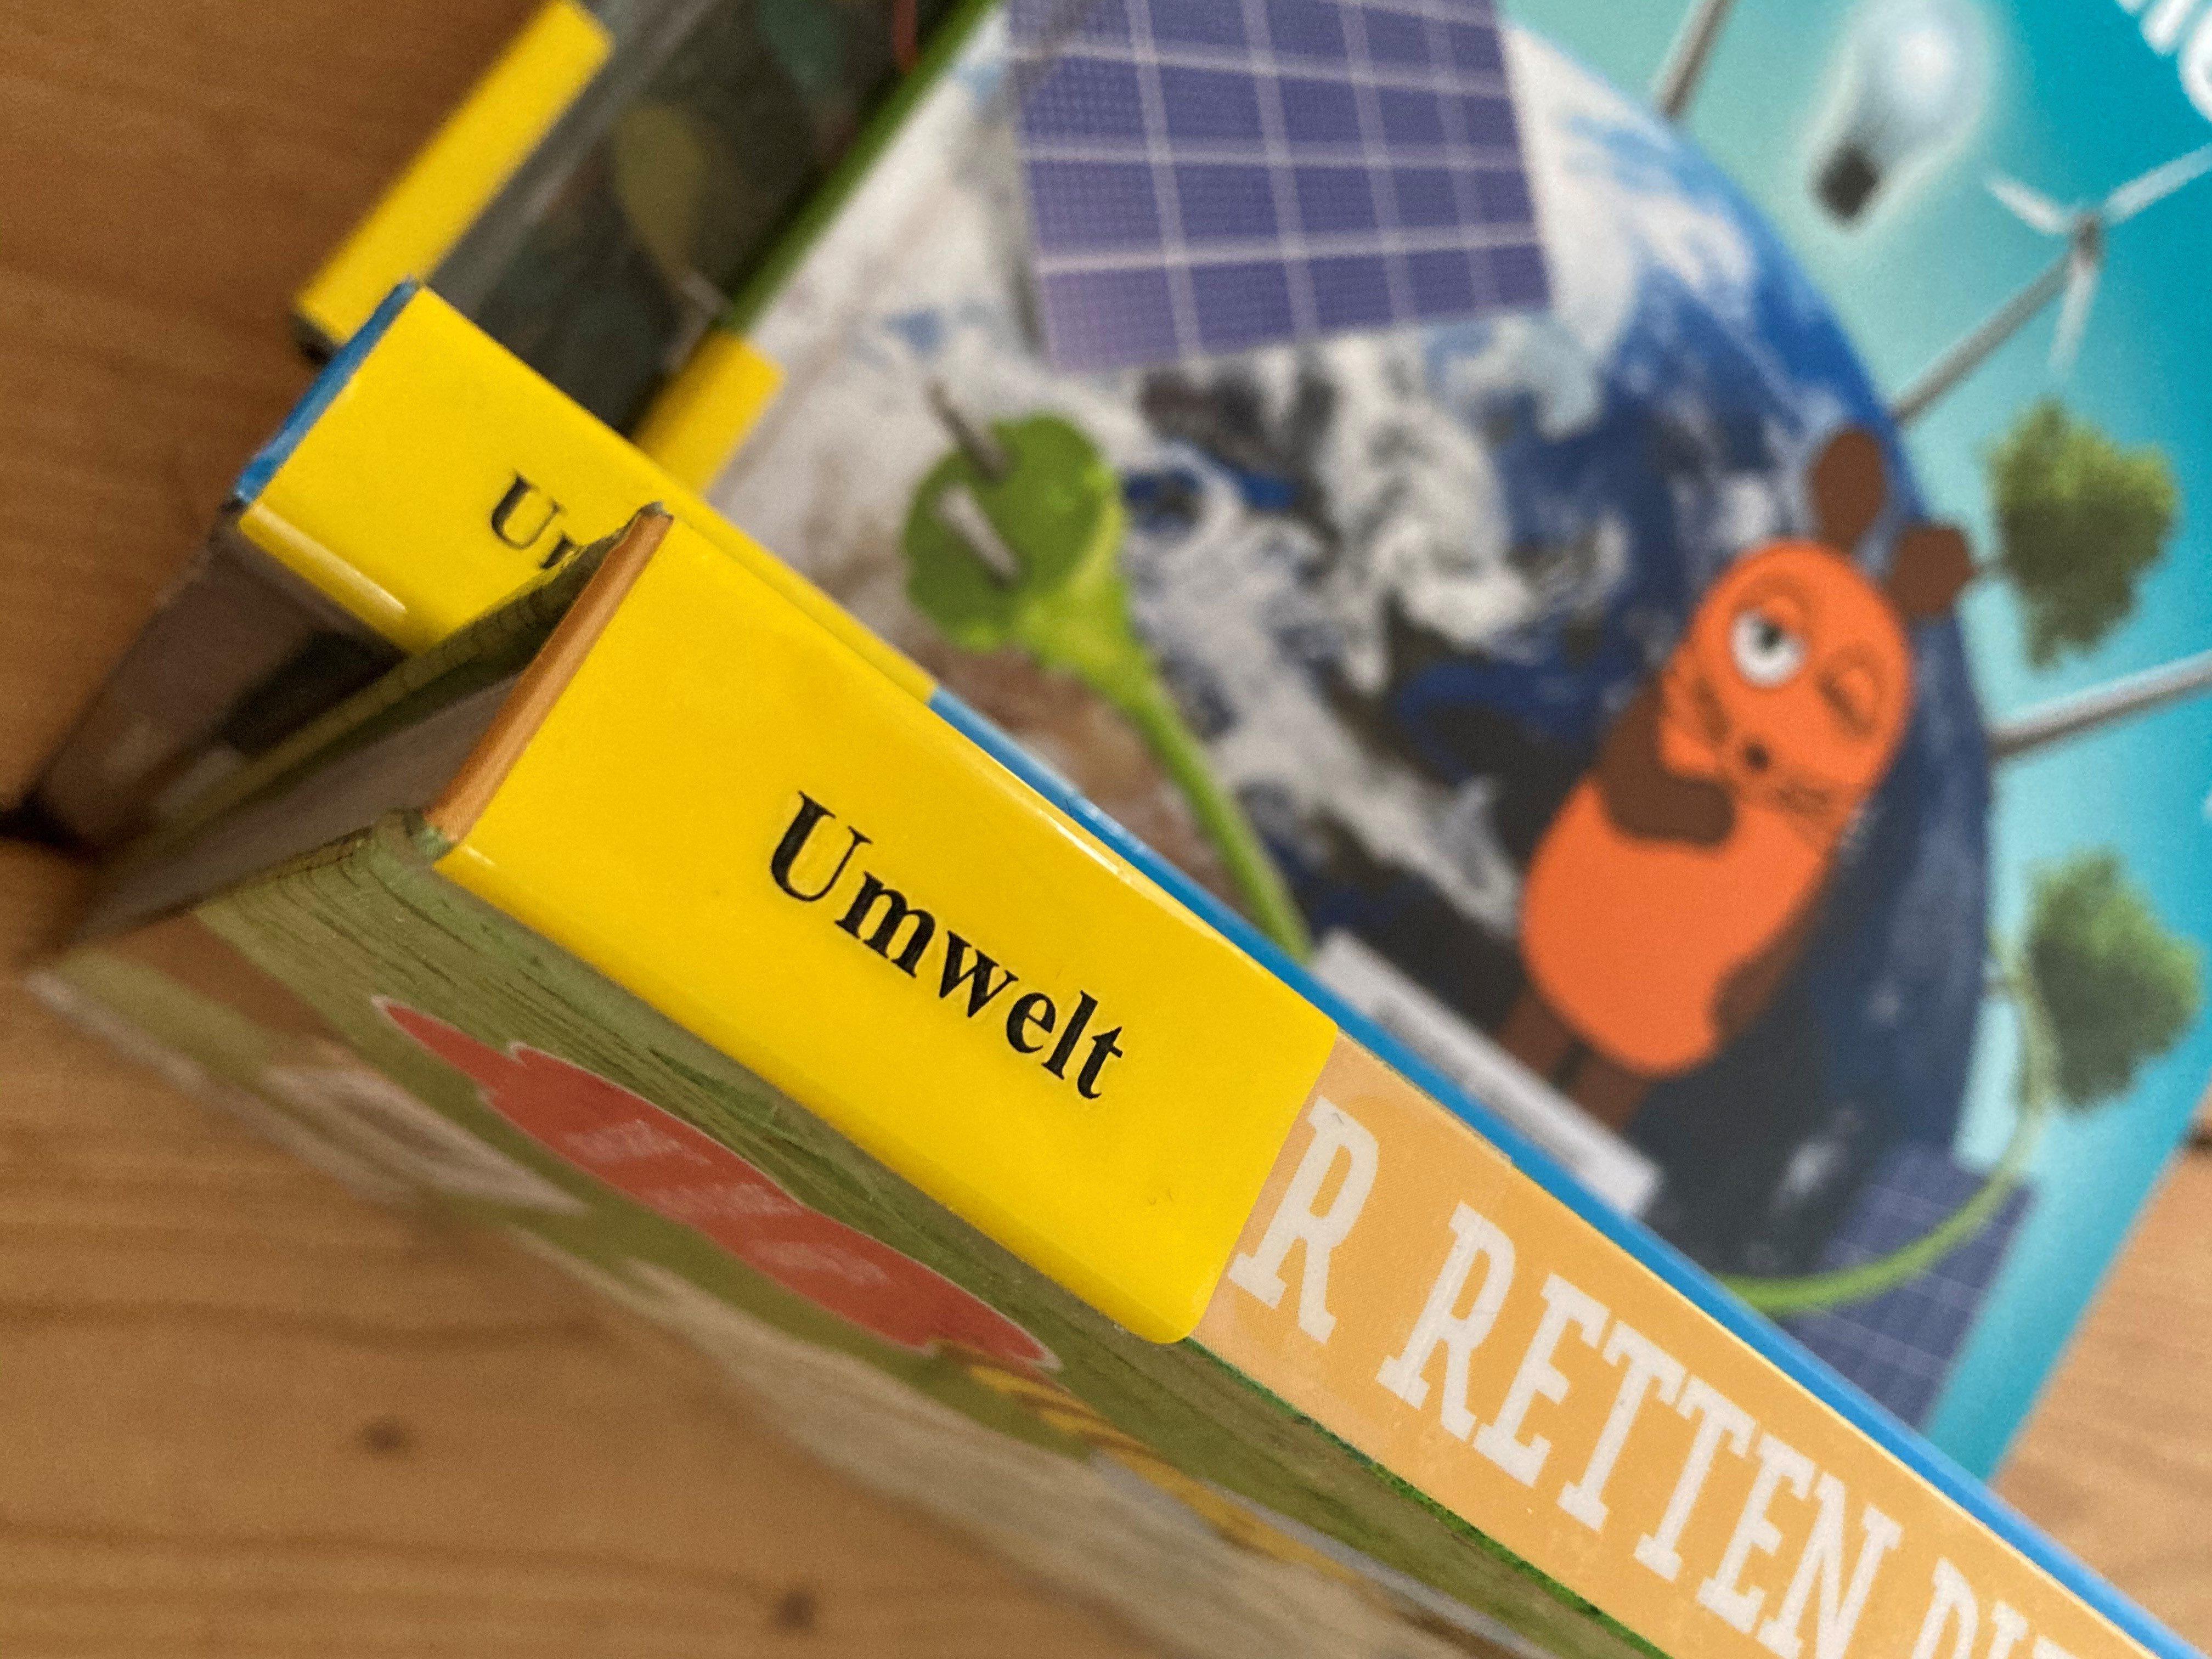 bücherkiste umwelt stadtbibliothek meerbusch